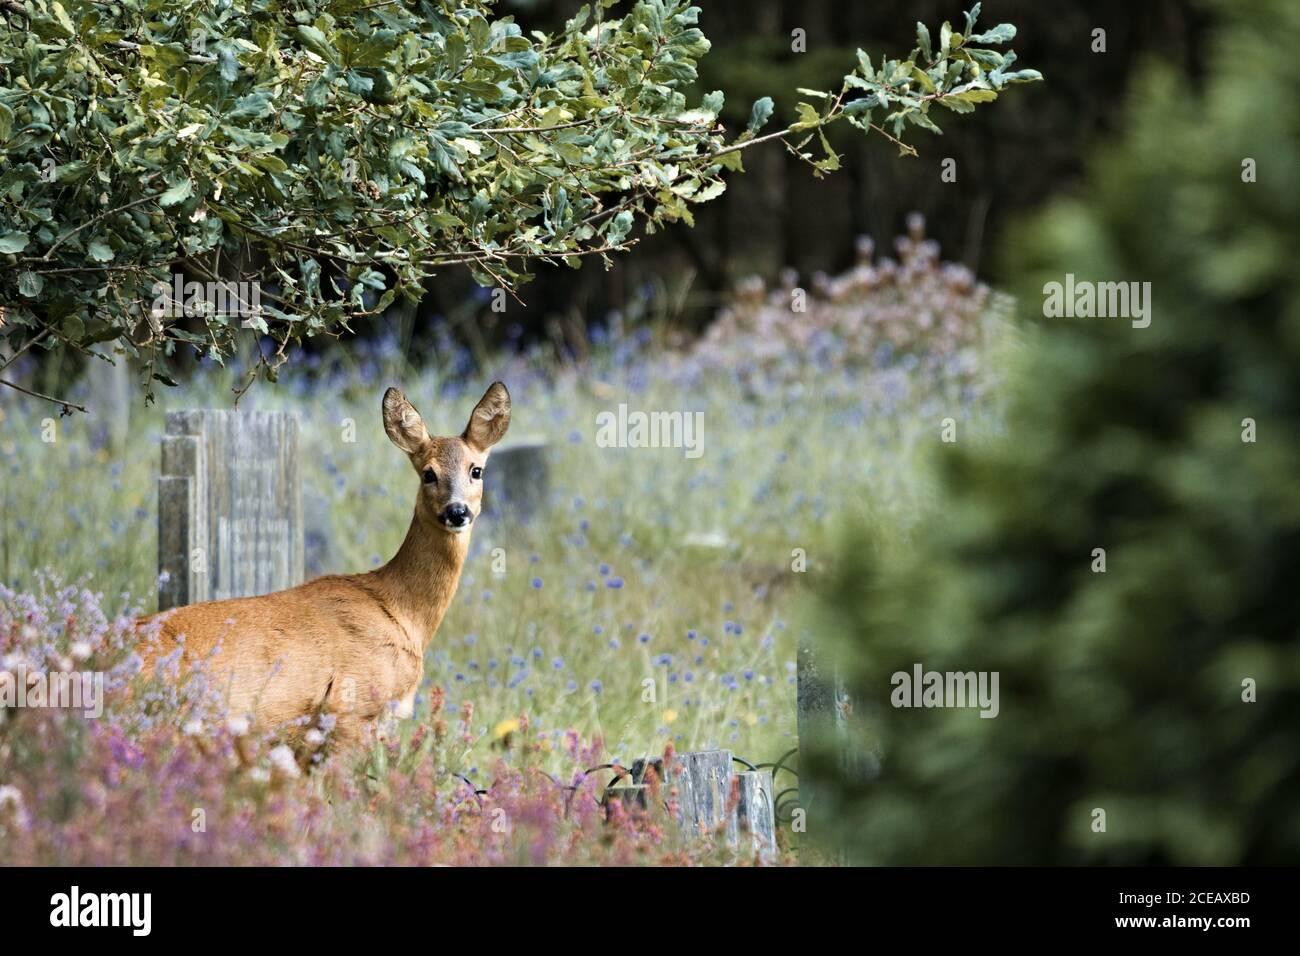 Female roe deer doe (Capreolus capreolus) gazing into the distance of Brookwood cemetery Stock Photo